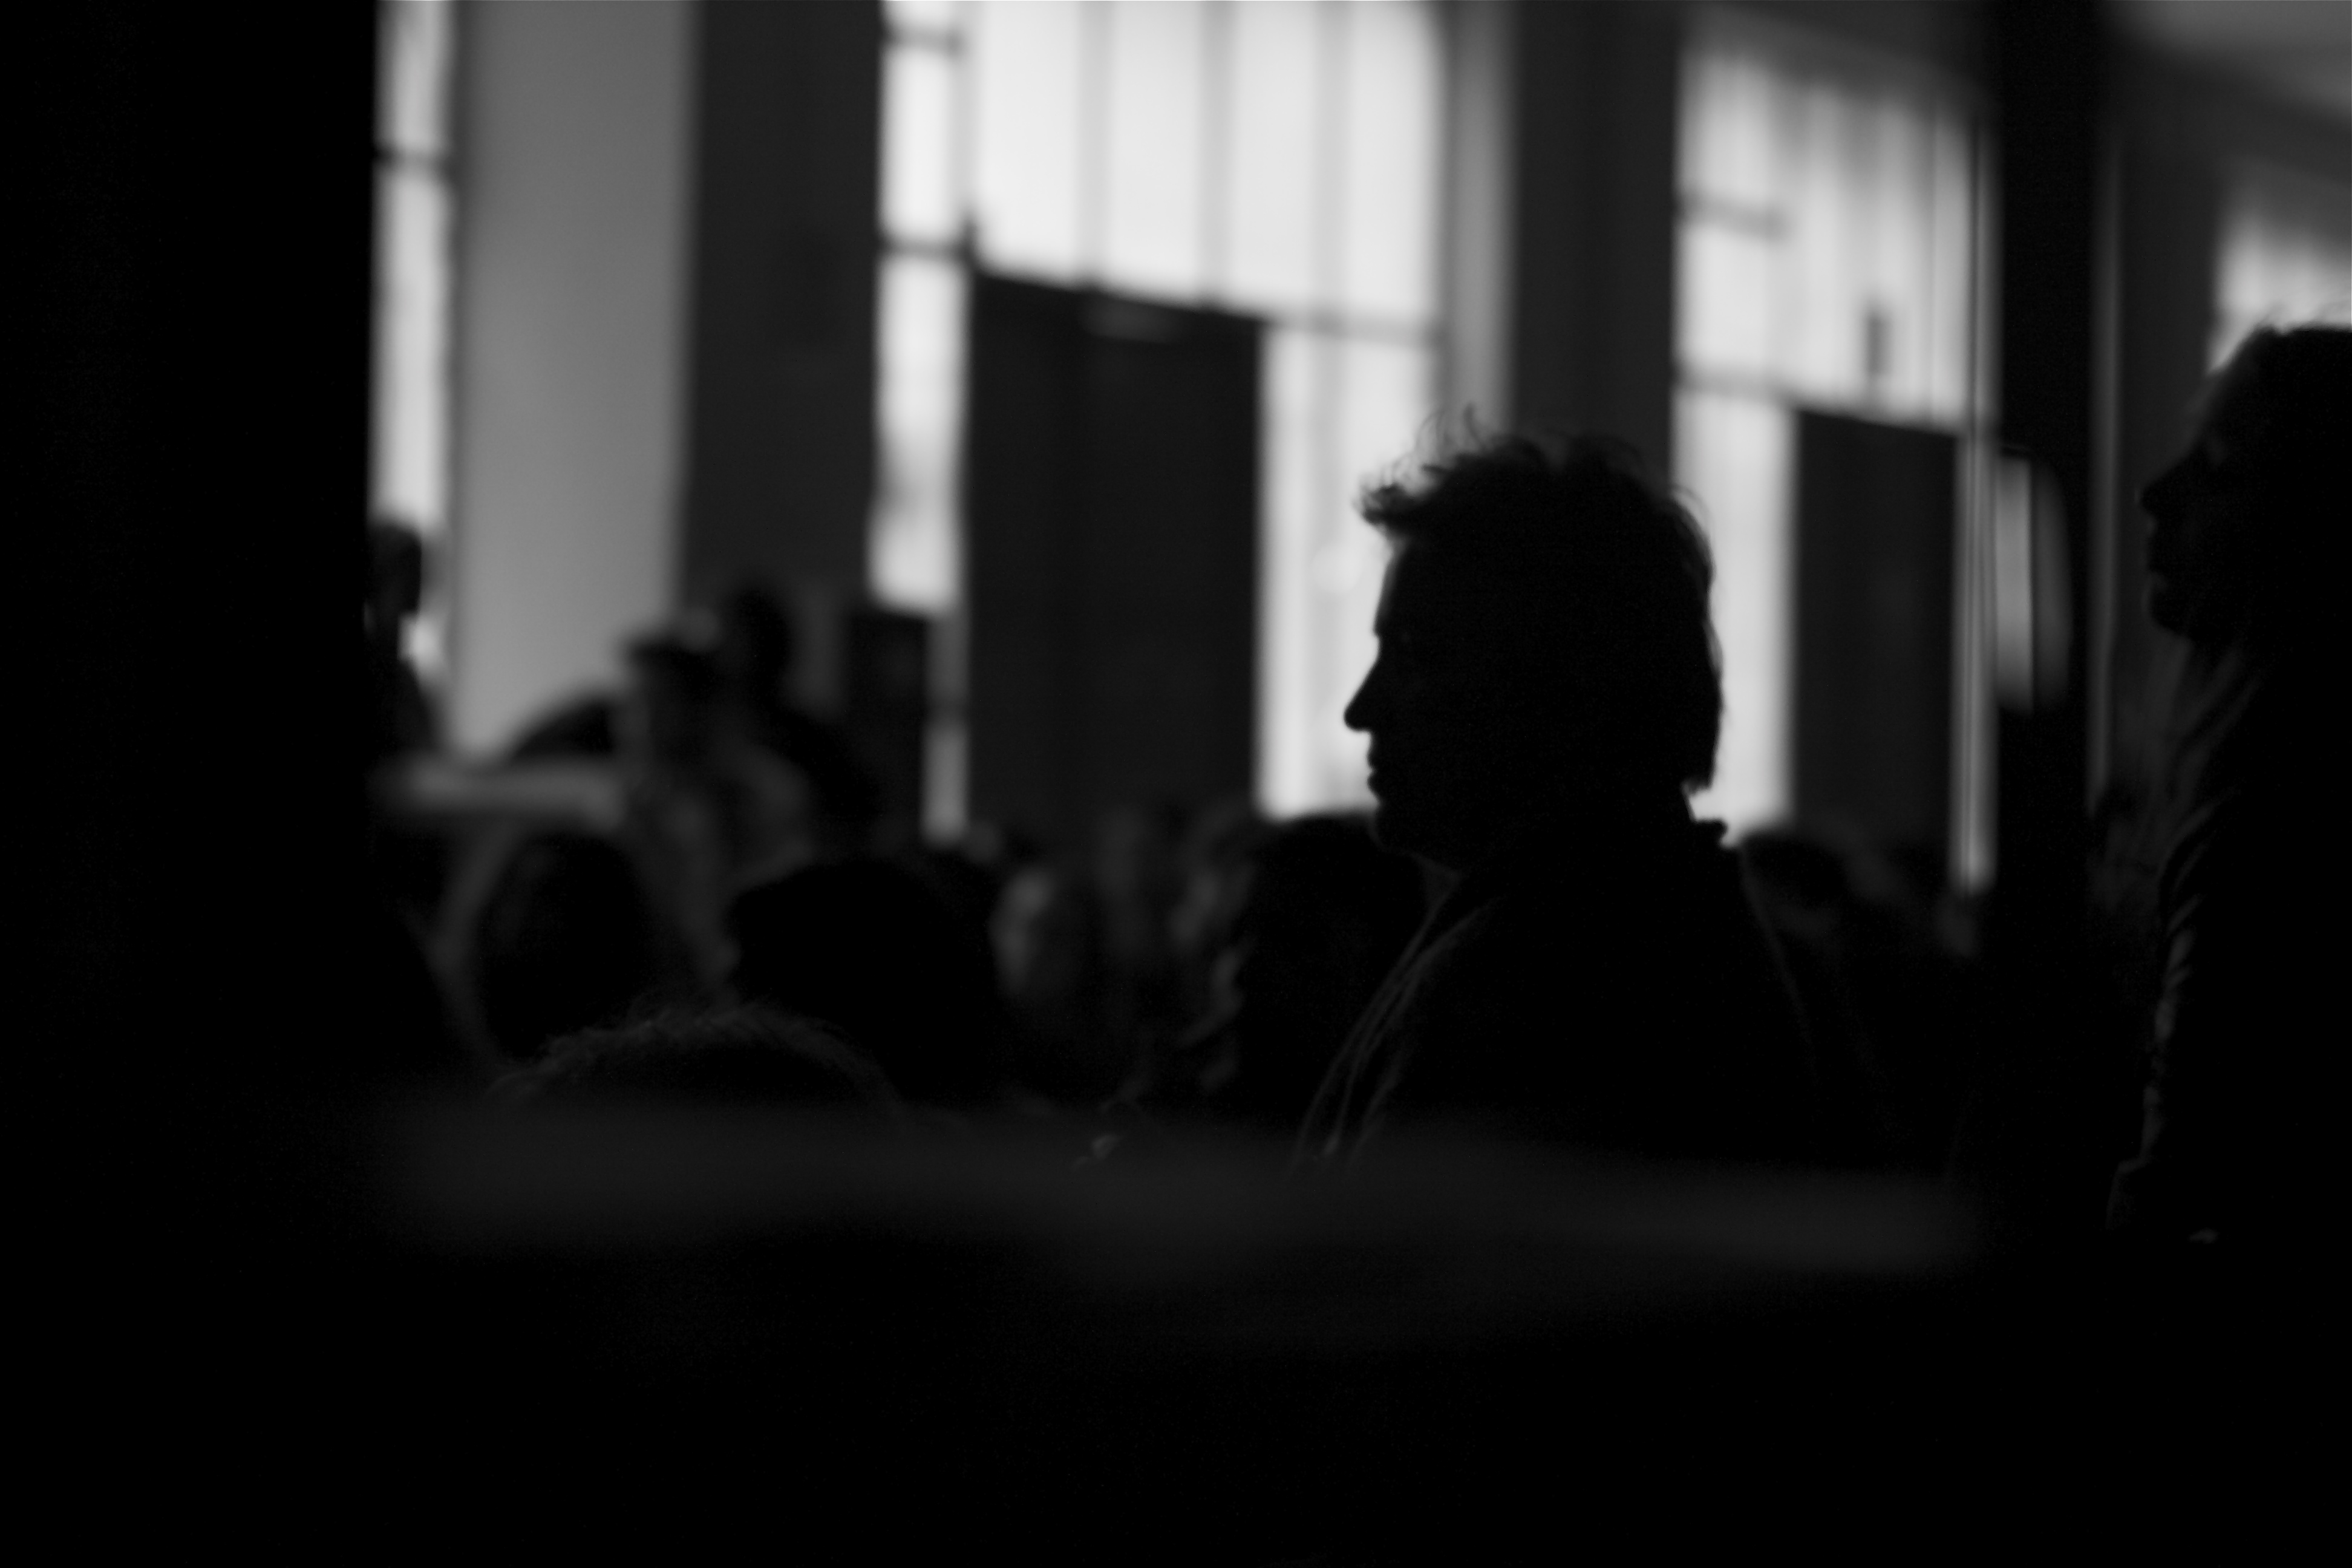 Flickr - Aron Demetz - Dialoghi e materia - Workshop a cura di Franco Reina12